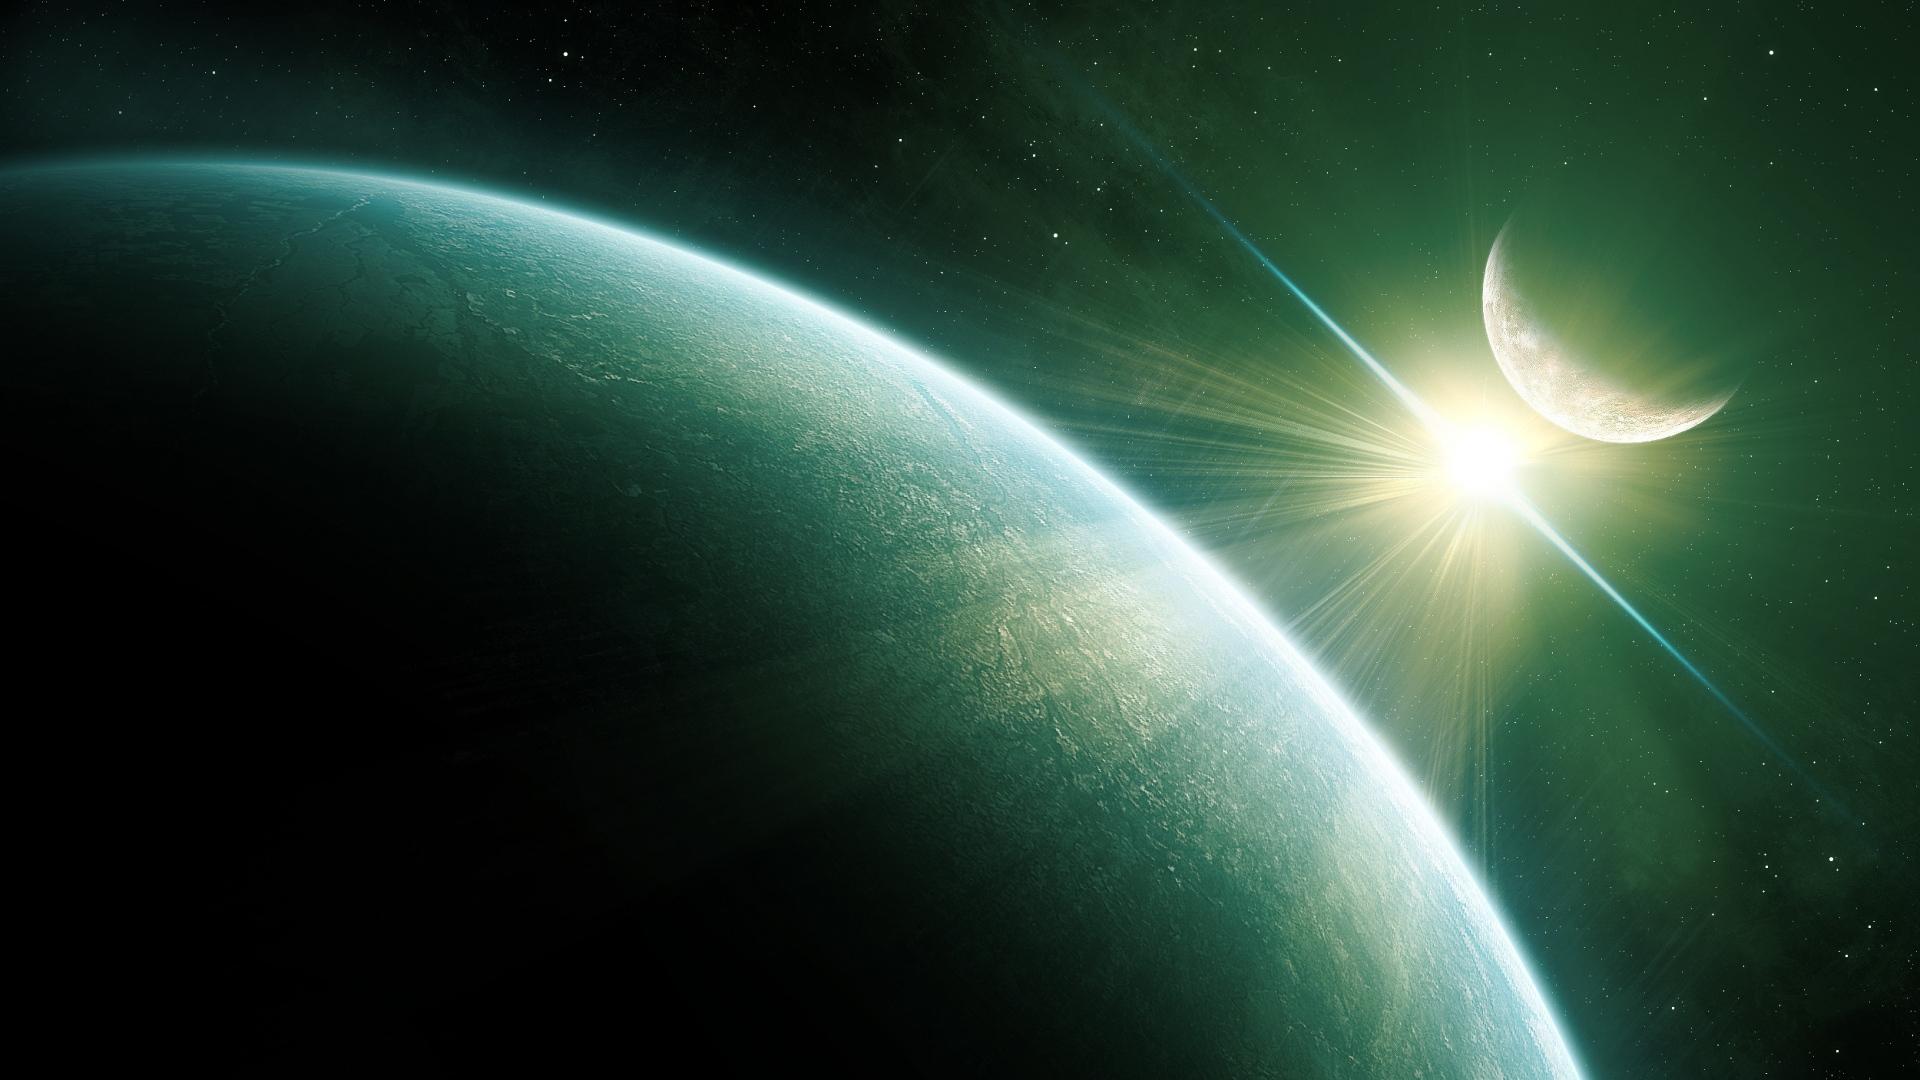 download wallpaper 1920x1080 green planet, light, sun, sky, space